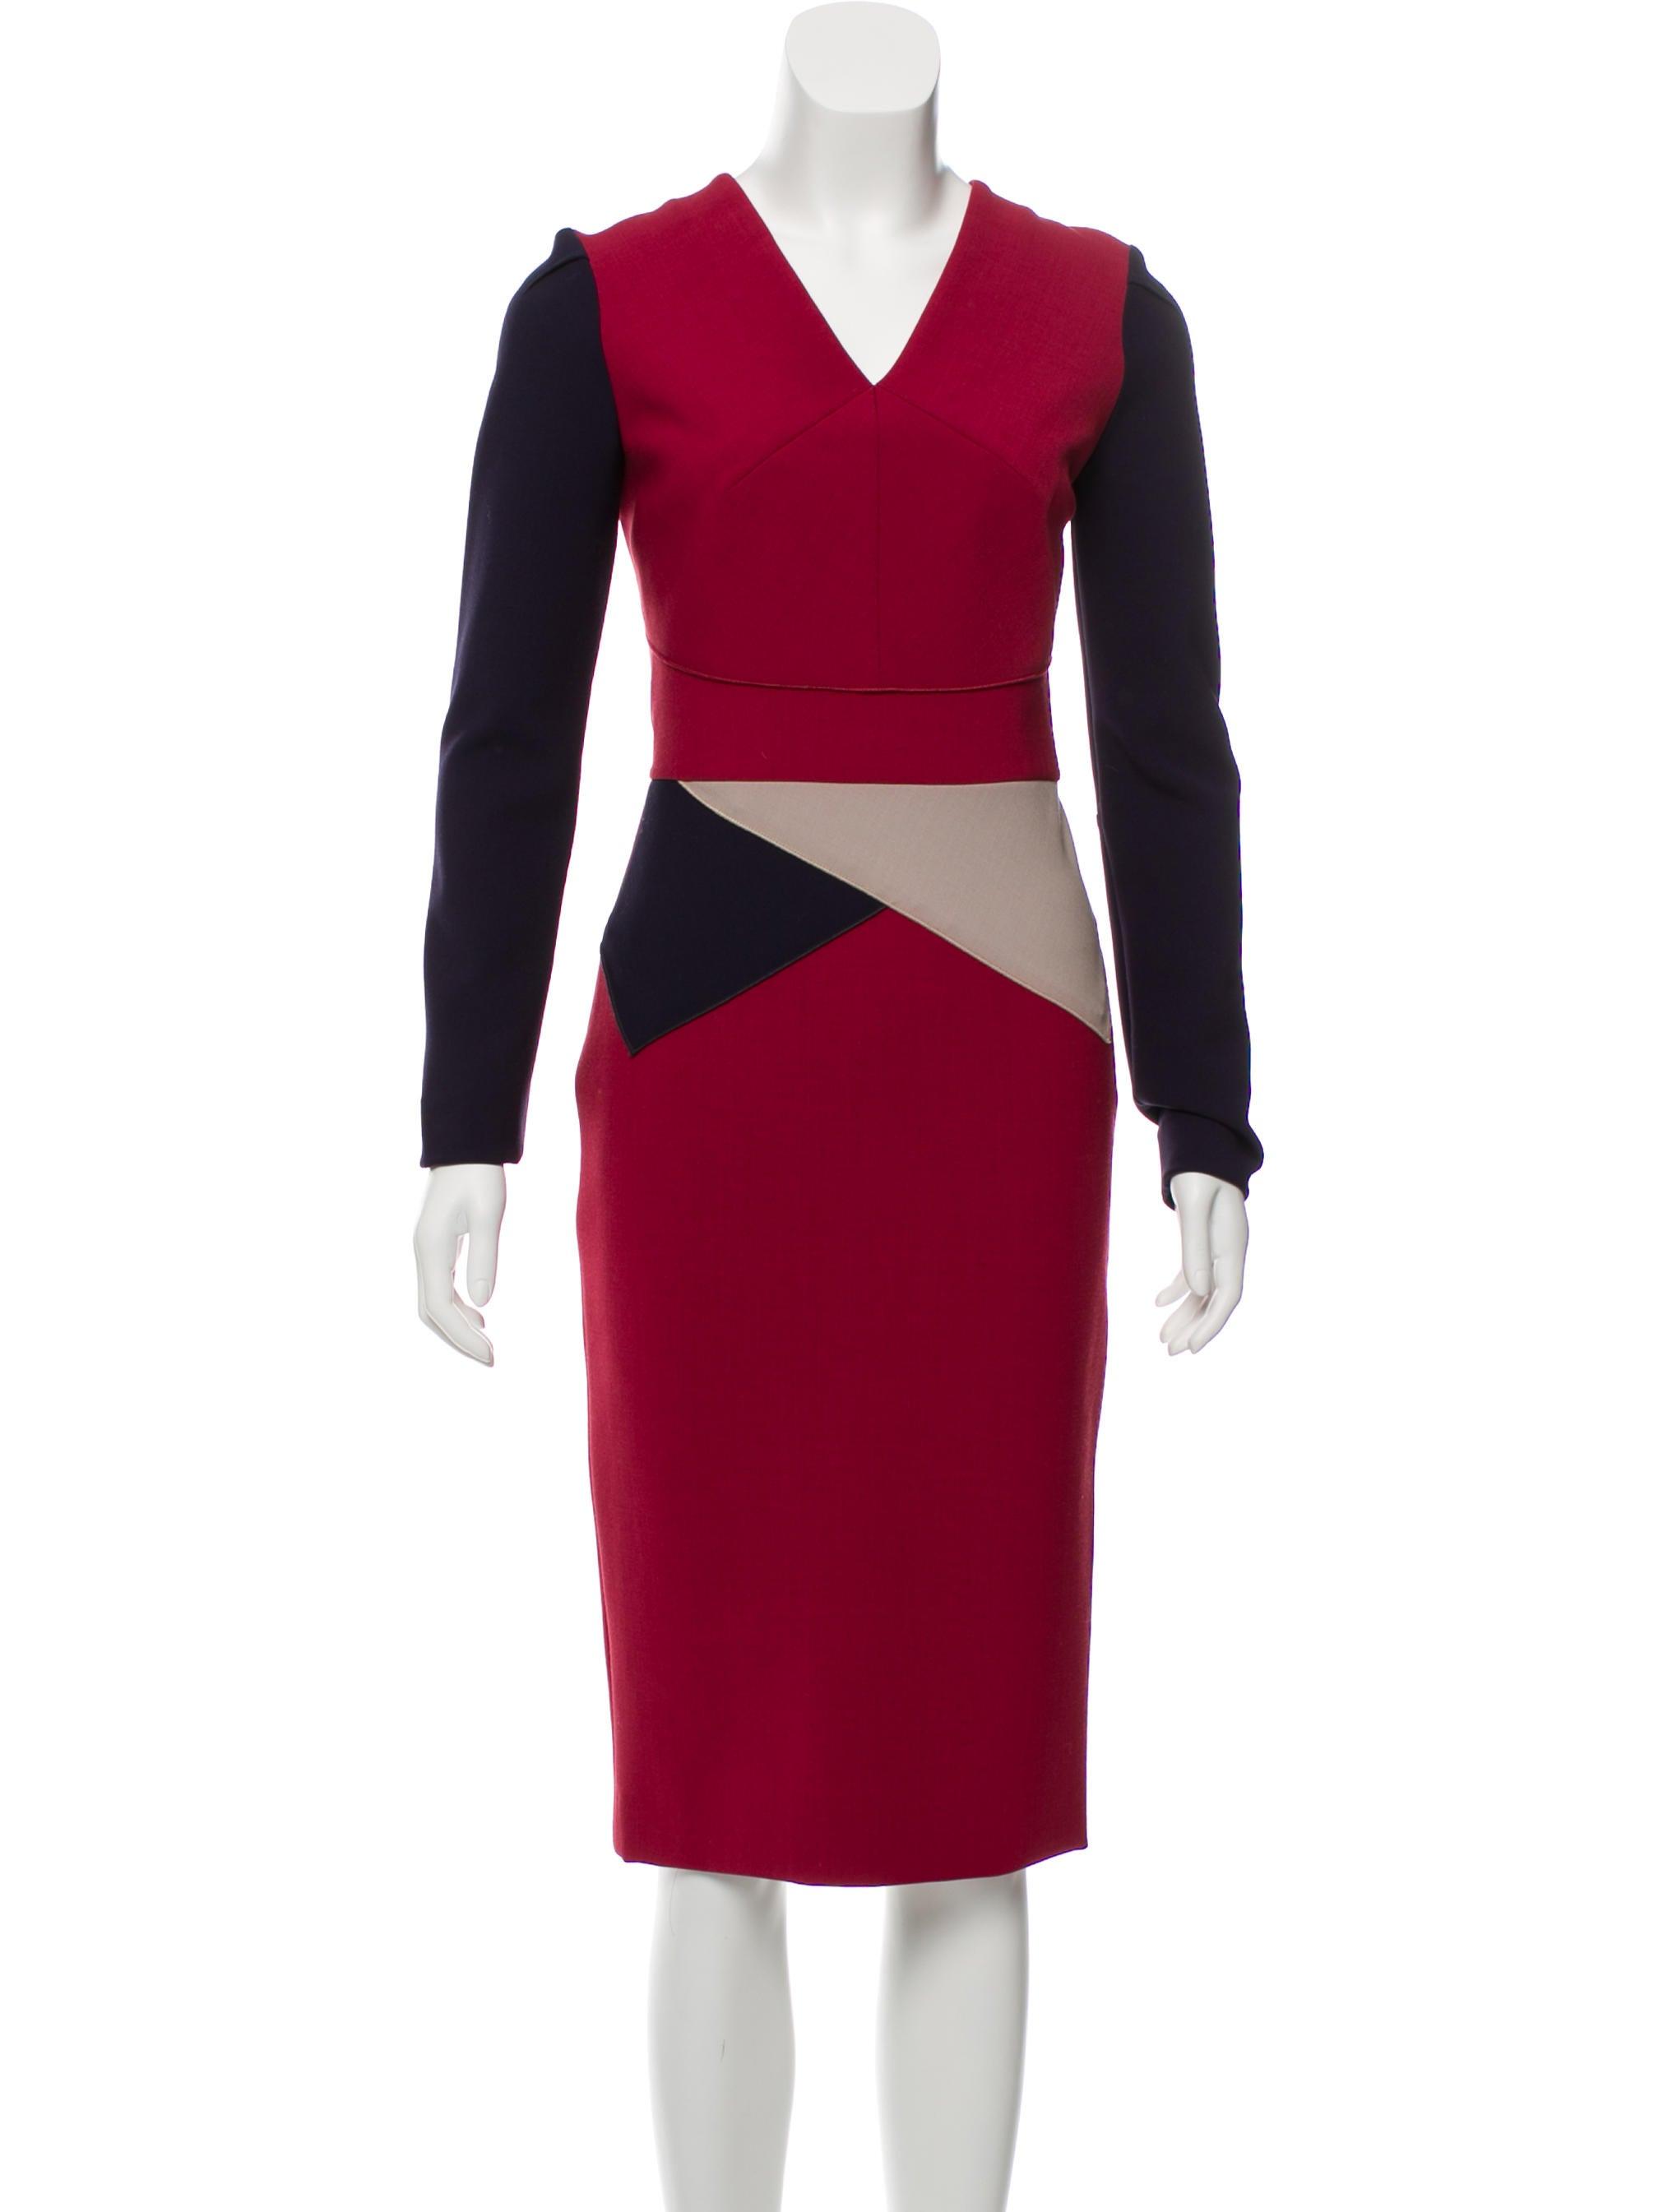 df6f0c76 Roland Mouret Long Sleeve Colorblock Dress - Clothing - ROL26379 ...